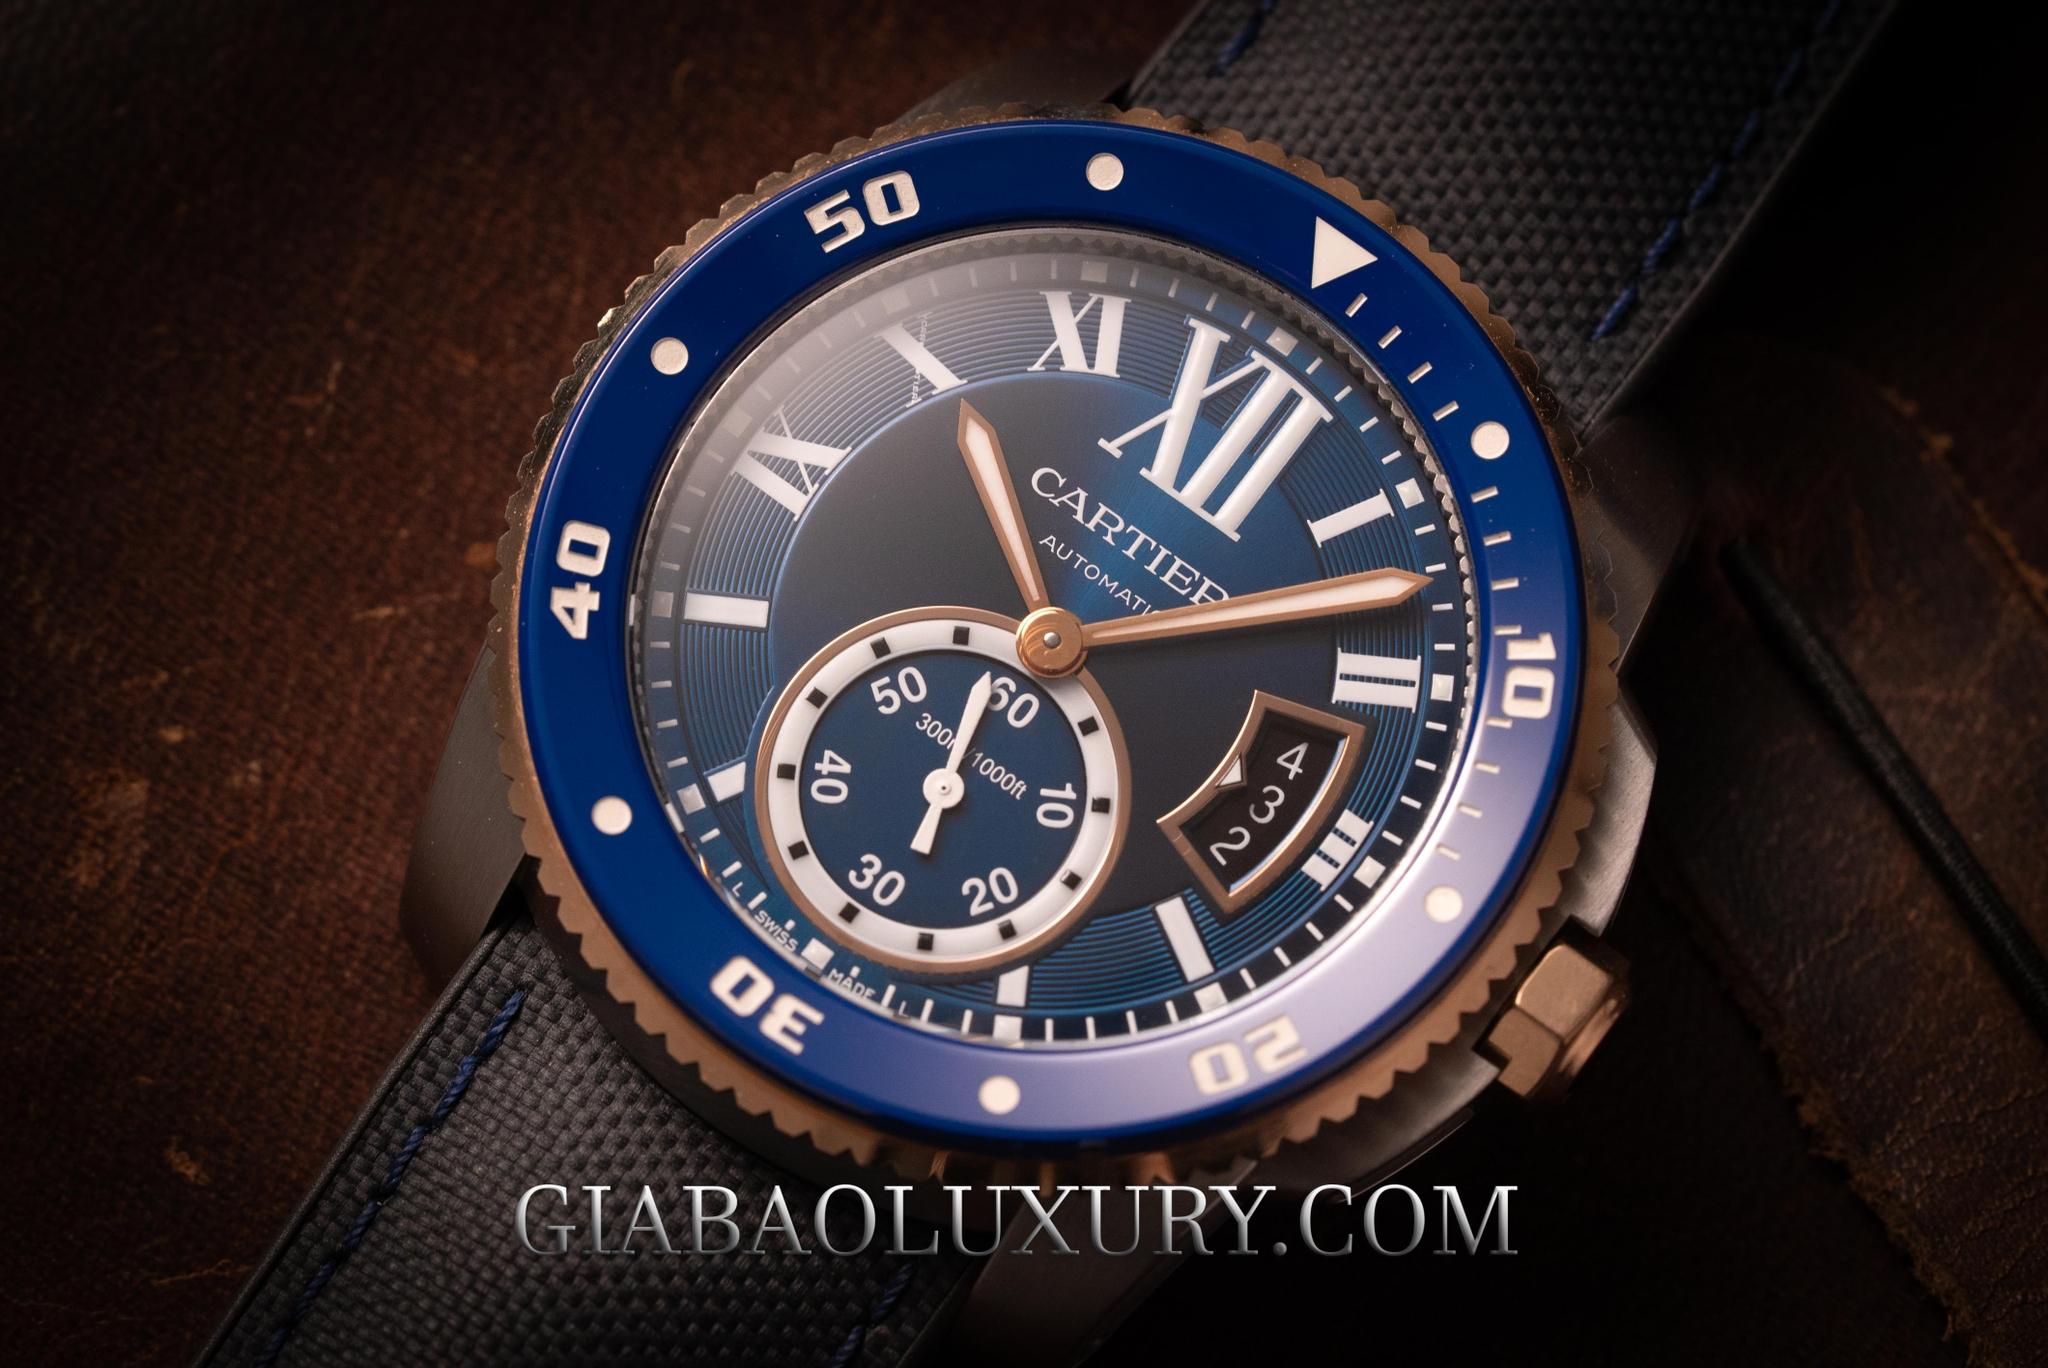 Review Đồng Hồ Cartier Calibre De Cartier Diver 42mm W2CA-0008